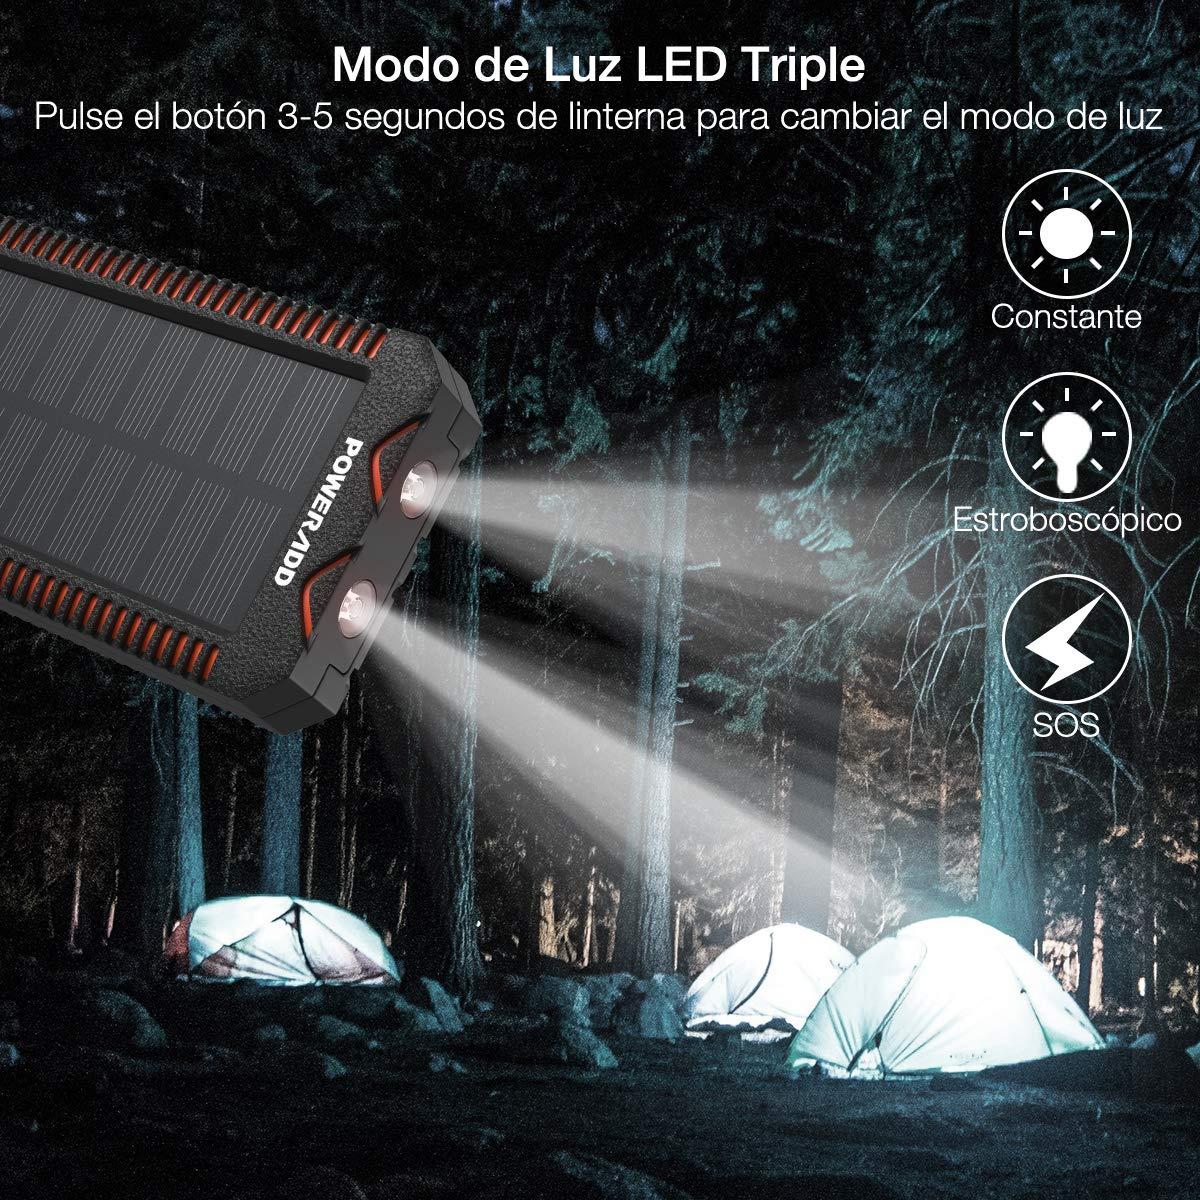 Poweradd Cargador Solar Portátil con 12000mAh, Batería Externa 2 Puertos de USB ( 5V/2.4A*2, 5V/3.4A Total ) Panel Solar con Alta Eficiencia de Conversión Impermeable Inteligente, Color Naranja y Negro.